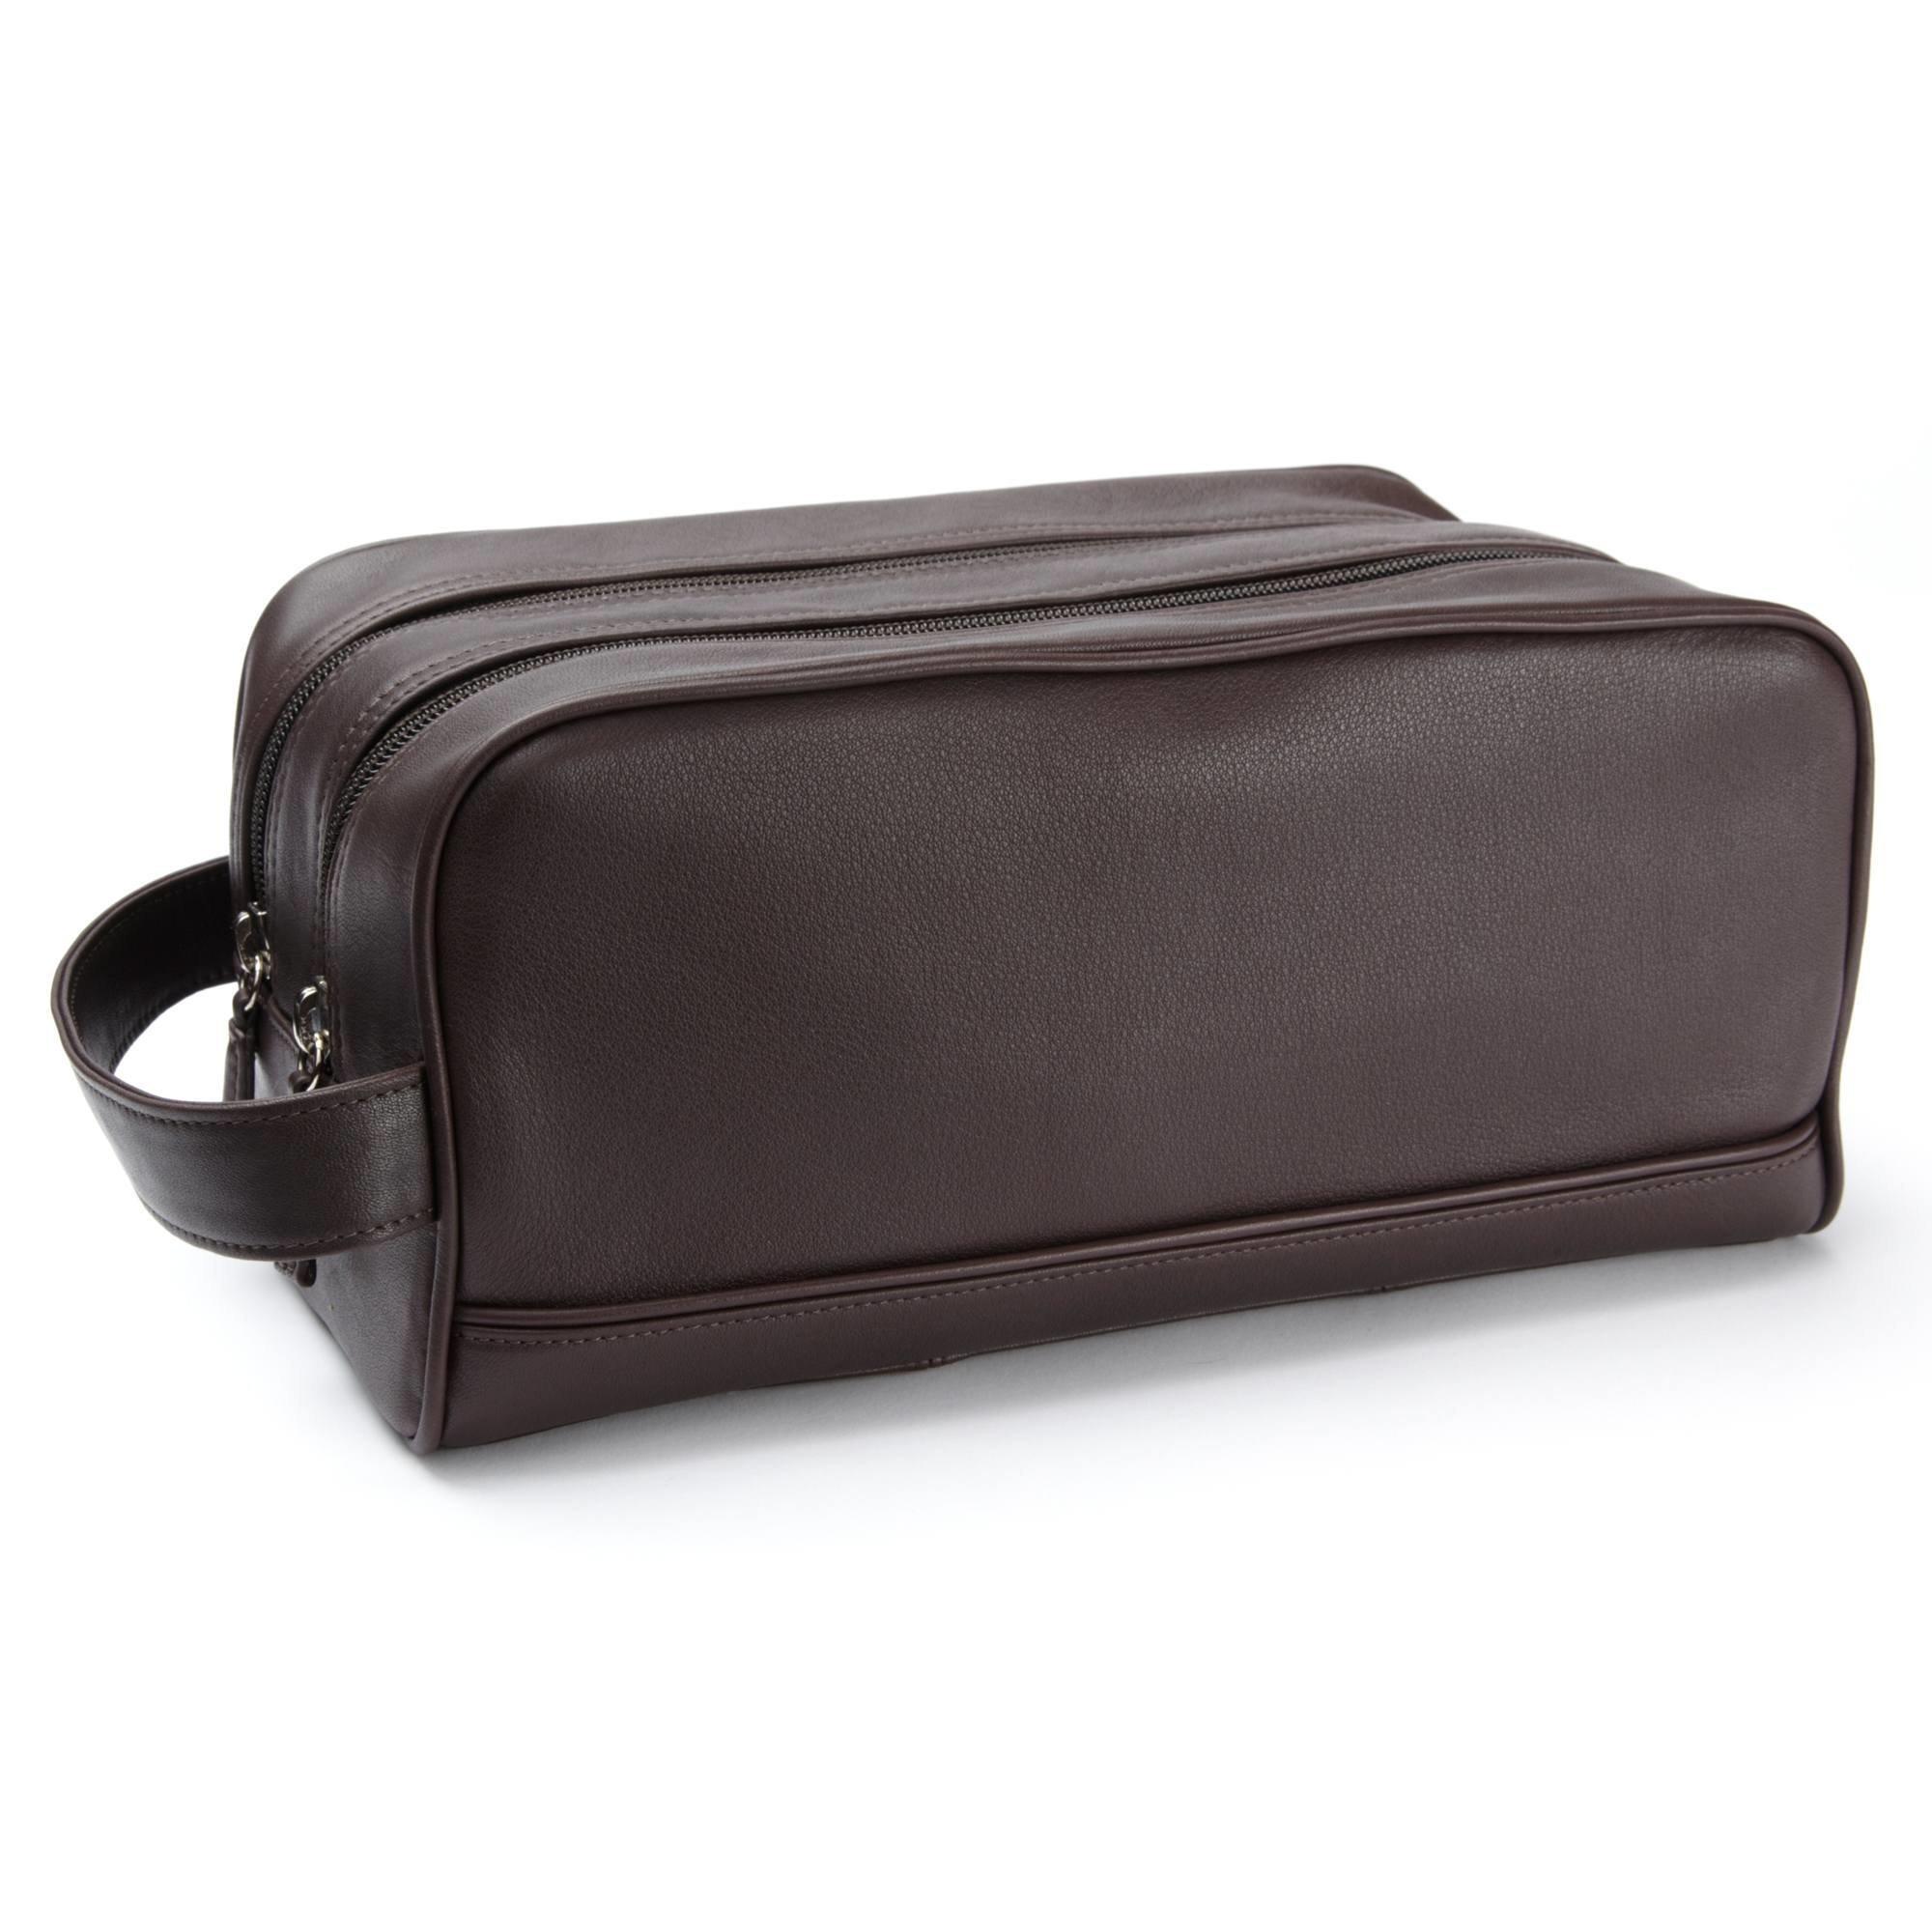 Double Zip Toiletry Bag - Full Grain Leather - Chocolate Brown (brown)